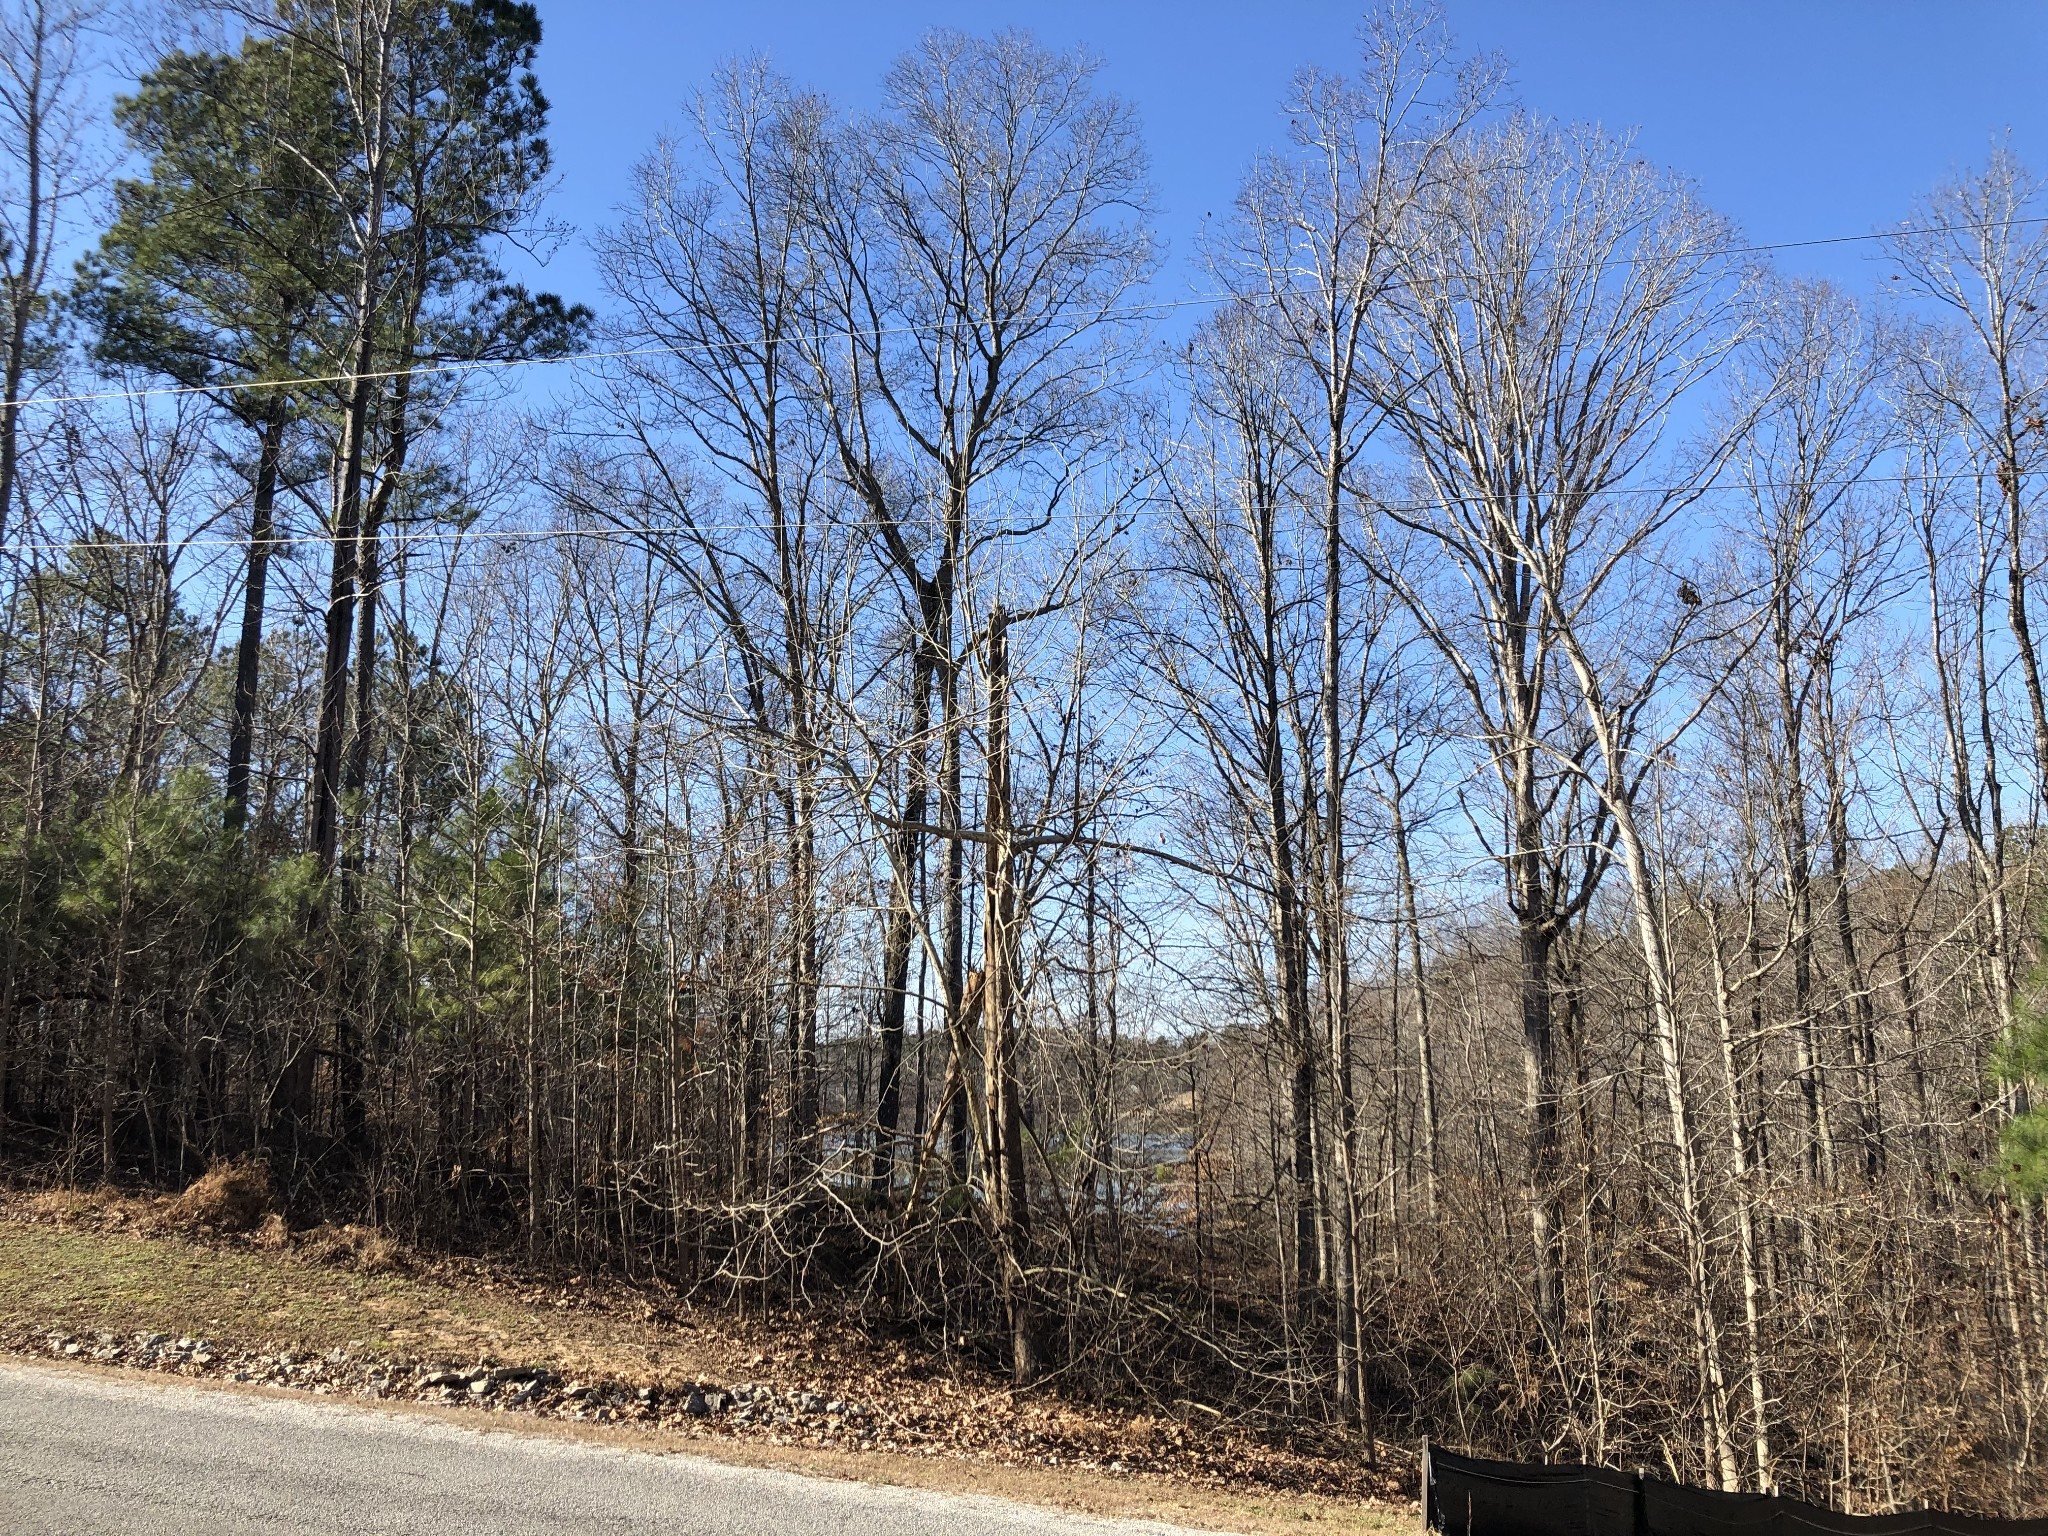 820 Strike King Dr, Cedar Grove, TN 38321 - Cedar Grove, TN real estate listing